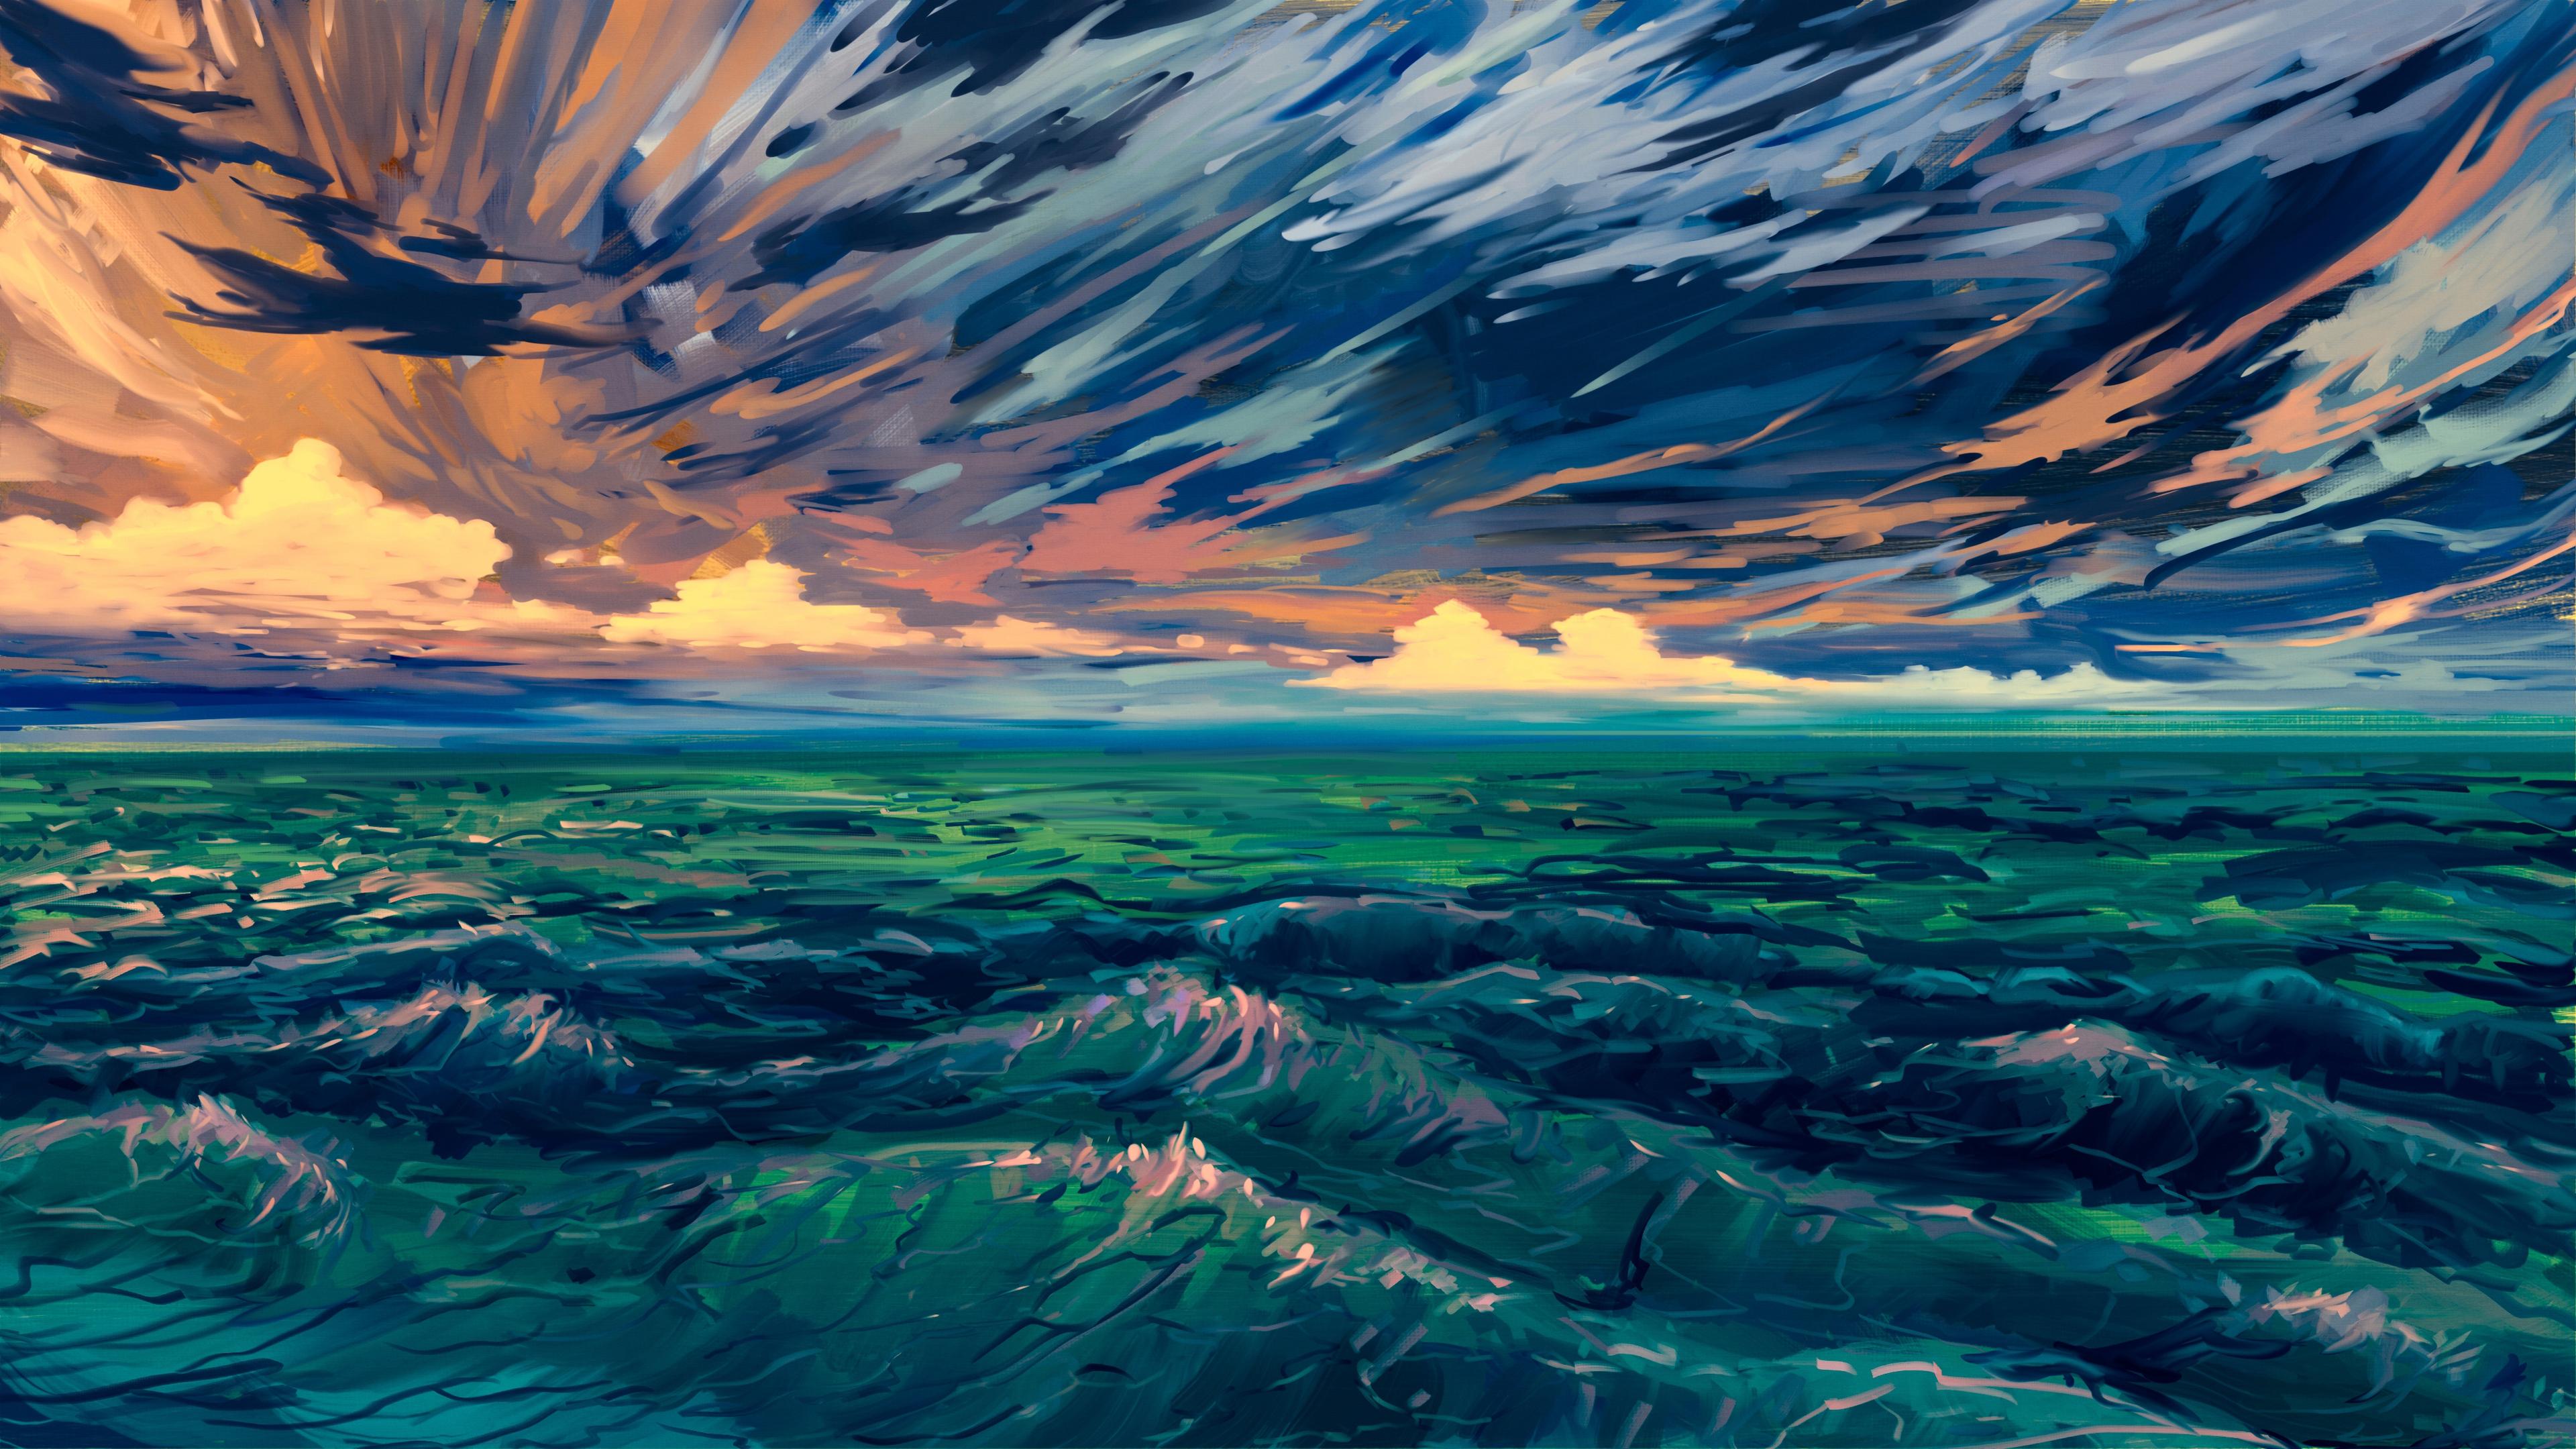 4k Wallpaper Landscape Art